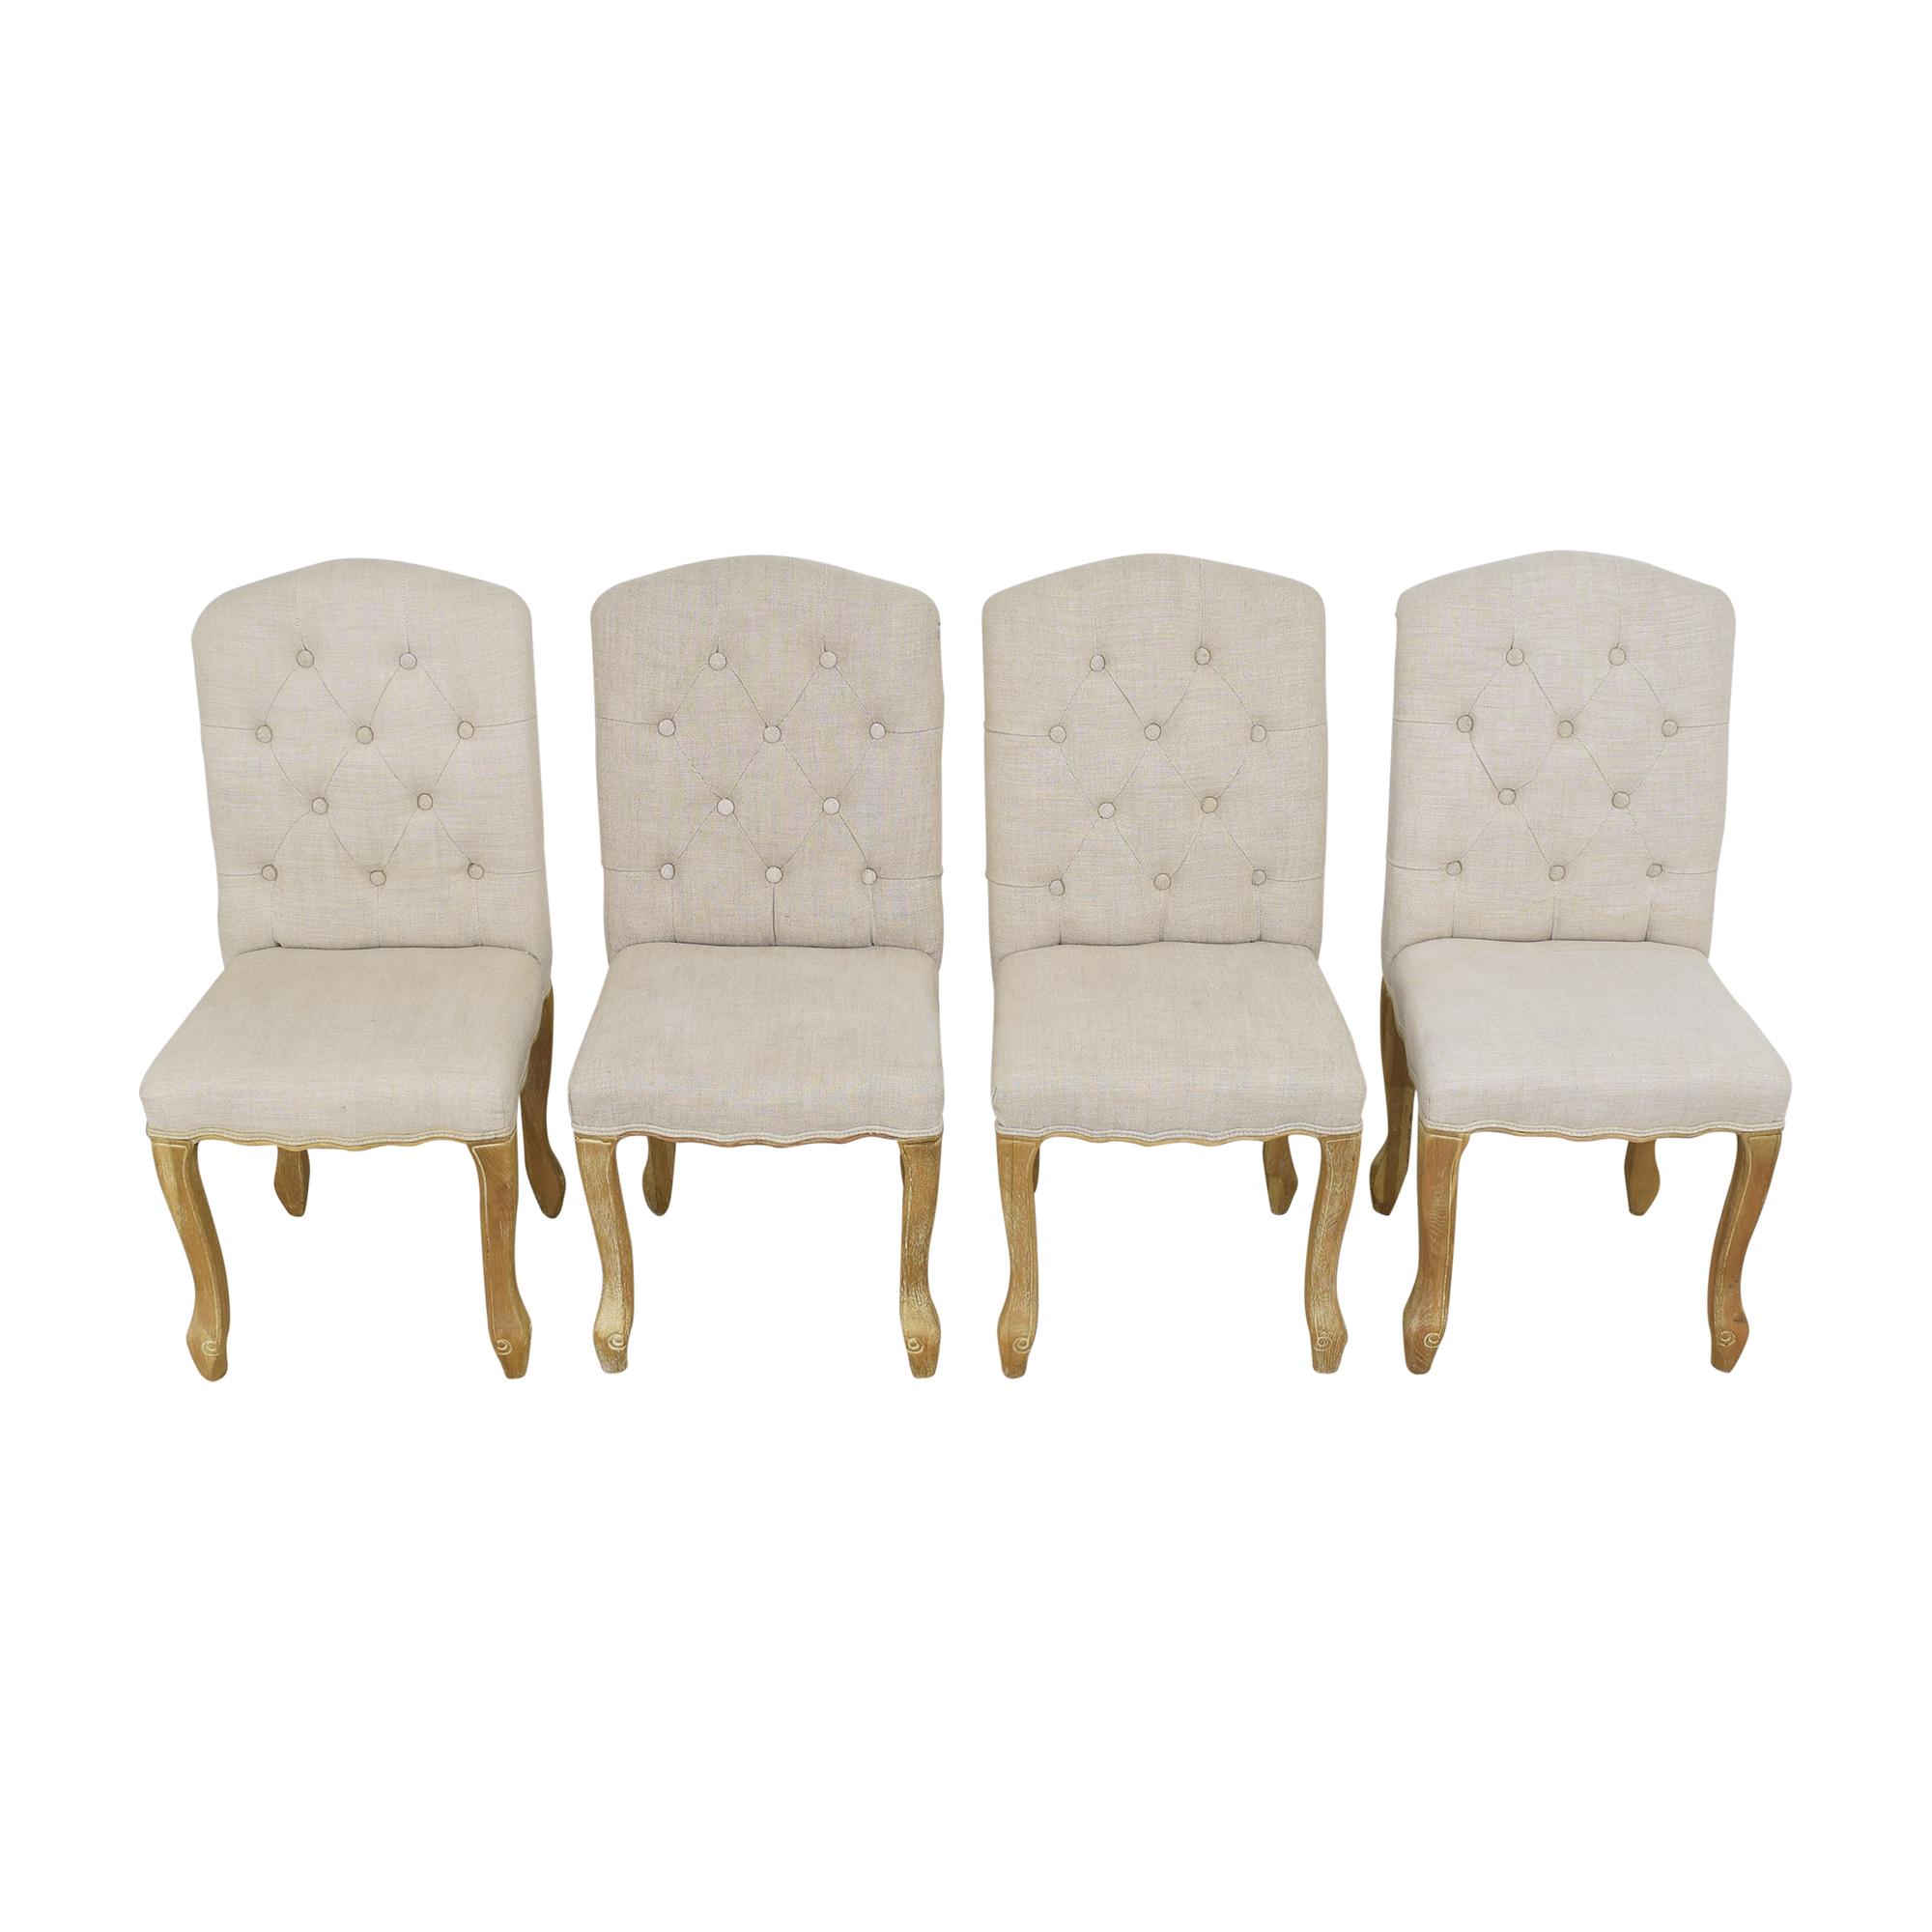 Zuo Modern Zuo Modern Noe Valley Chairs